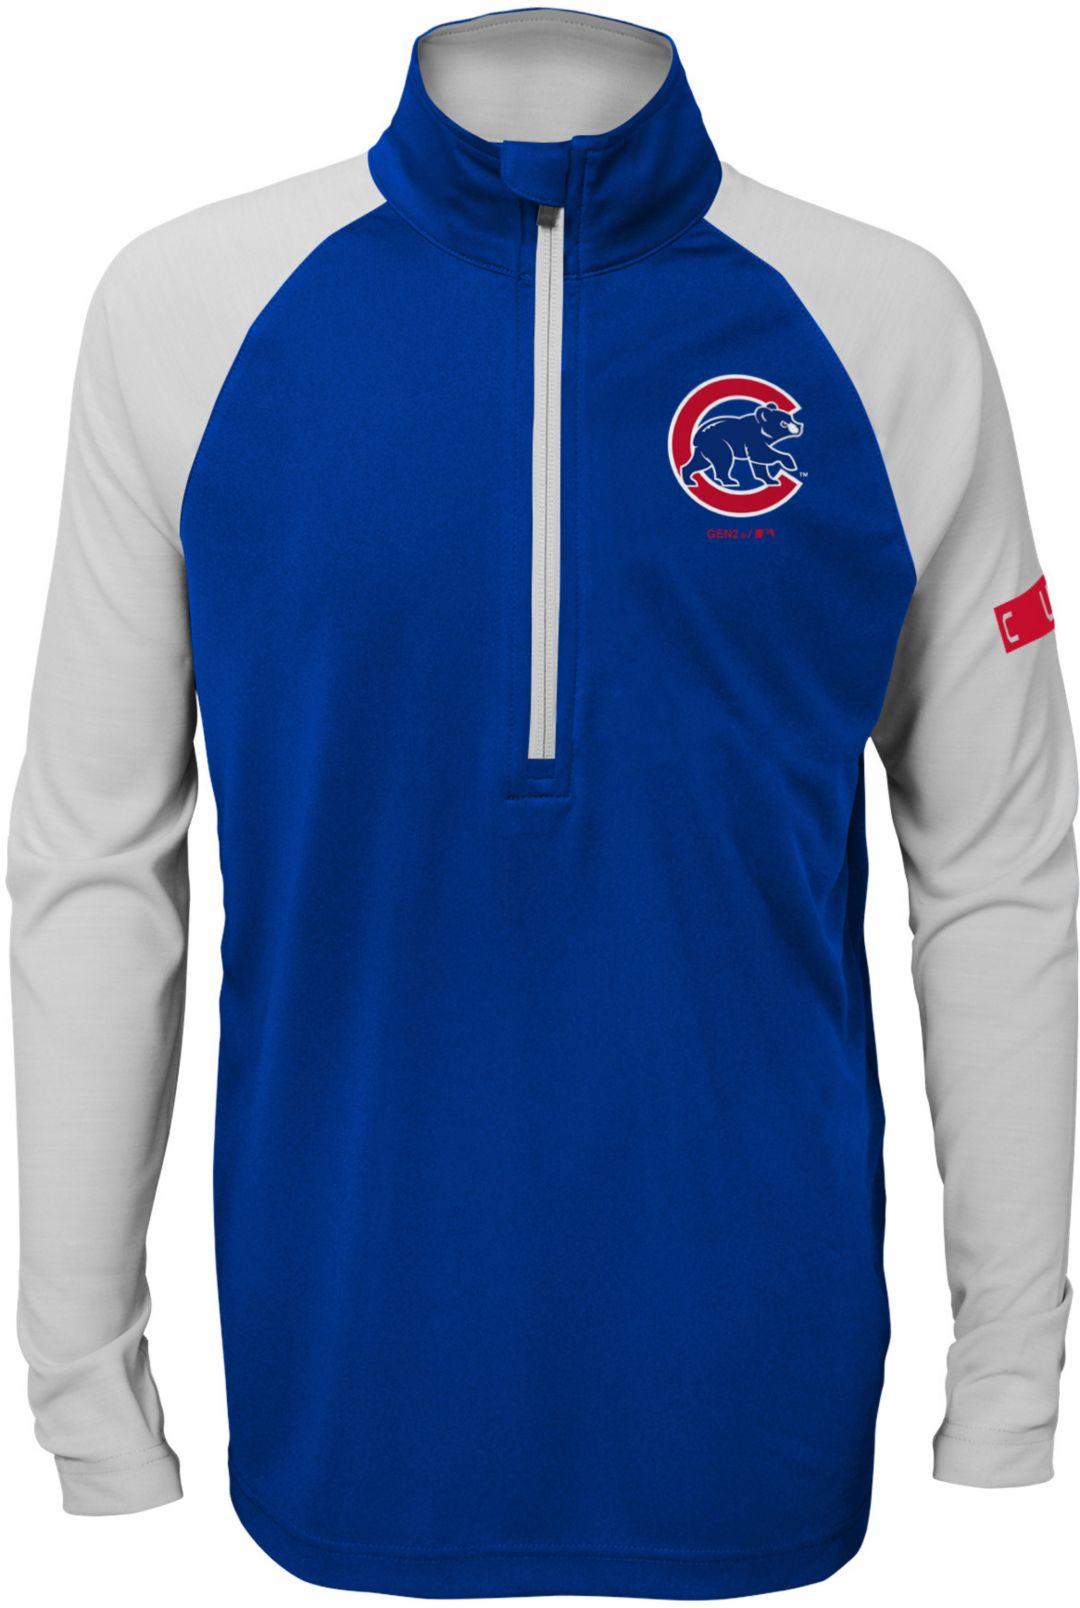 promo code 538fc 75595 Gen2 Youth Chicago Cubs Half-Zip Pullover